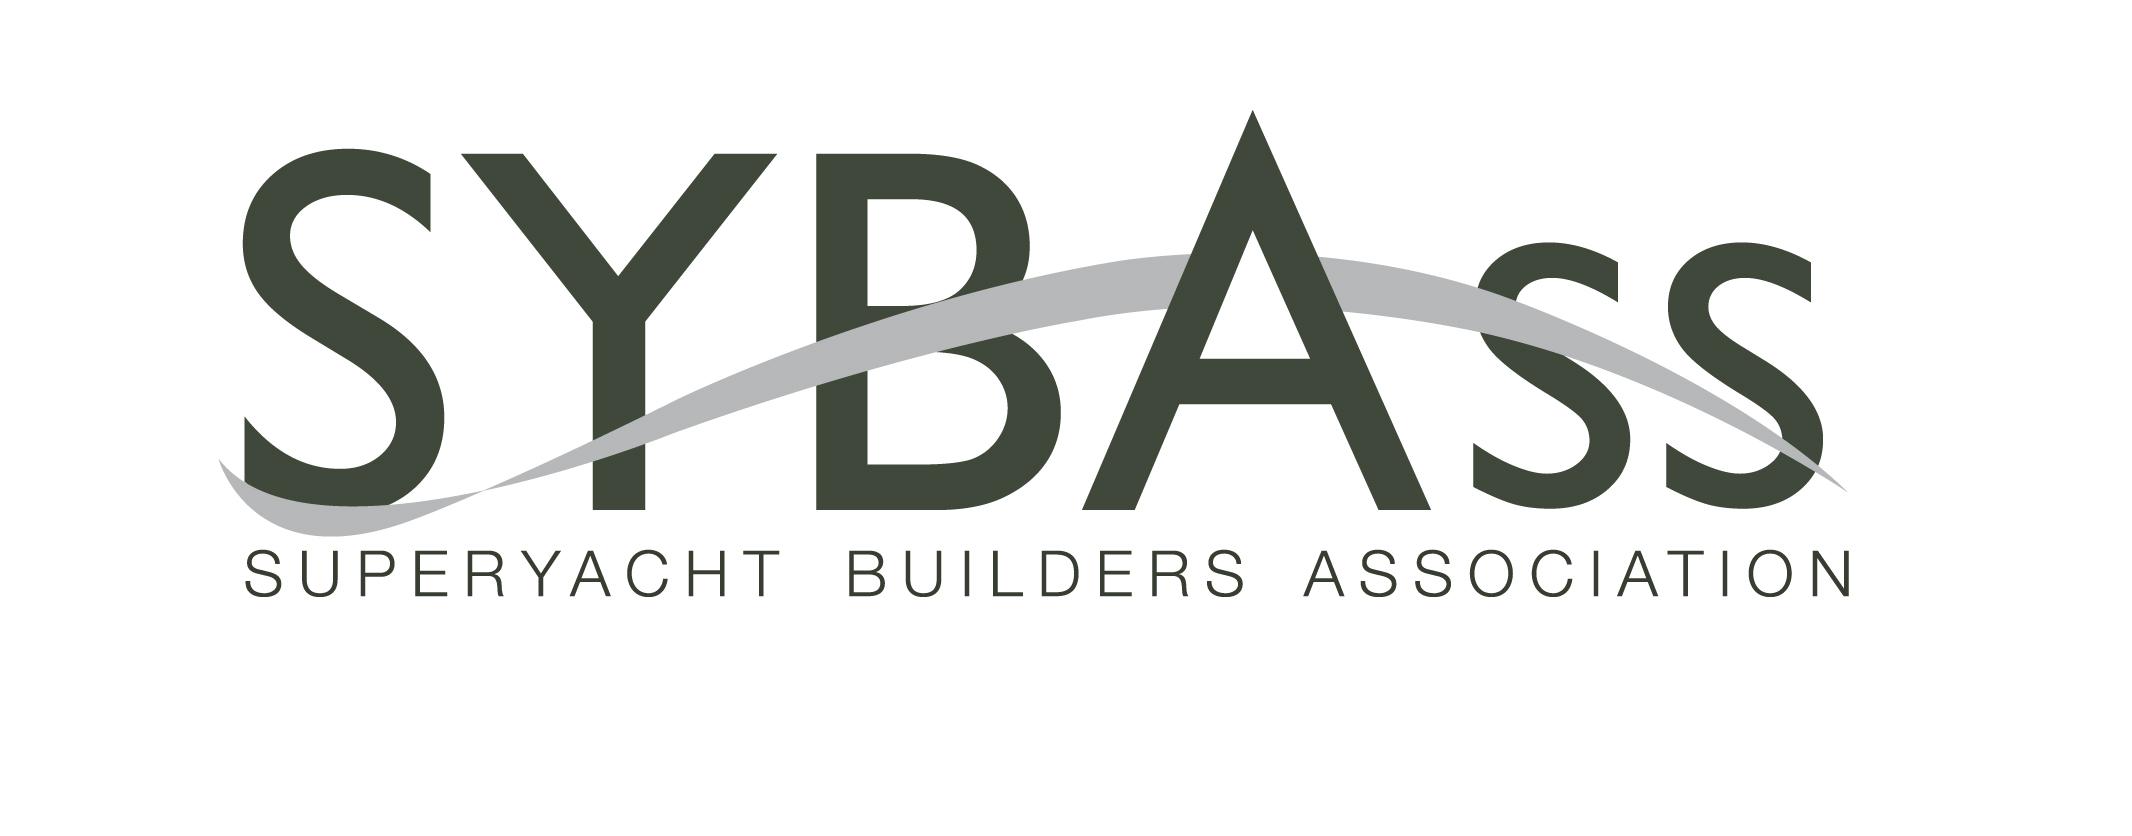 logo for Superyacht Builders Association